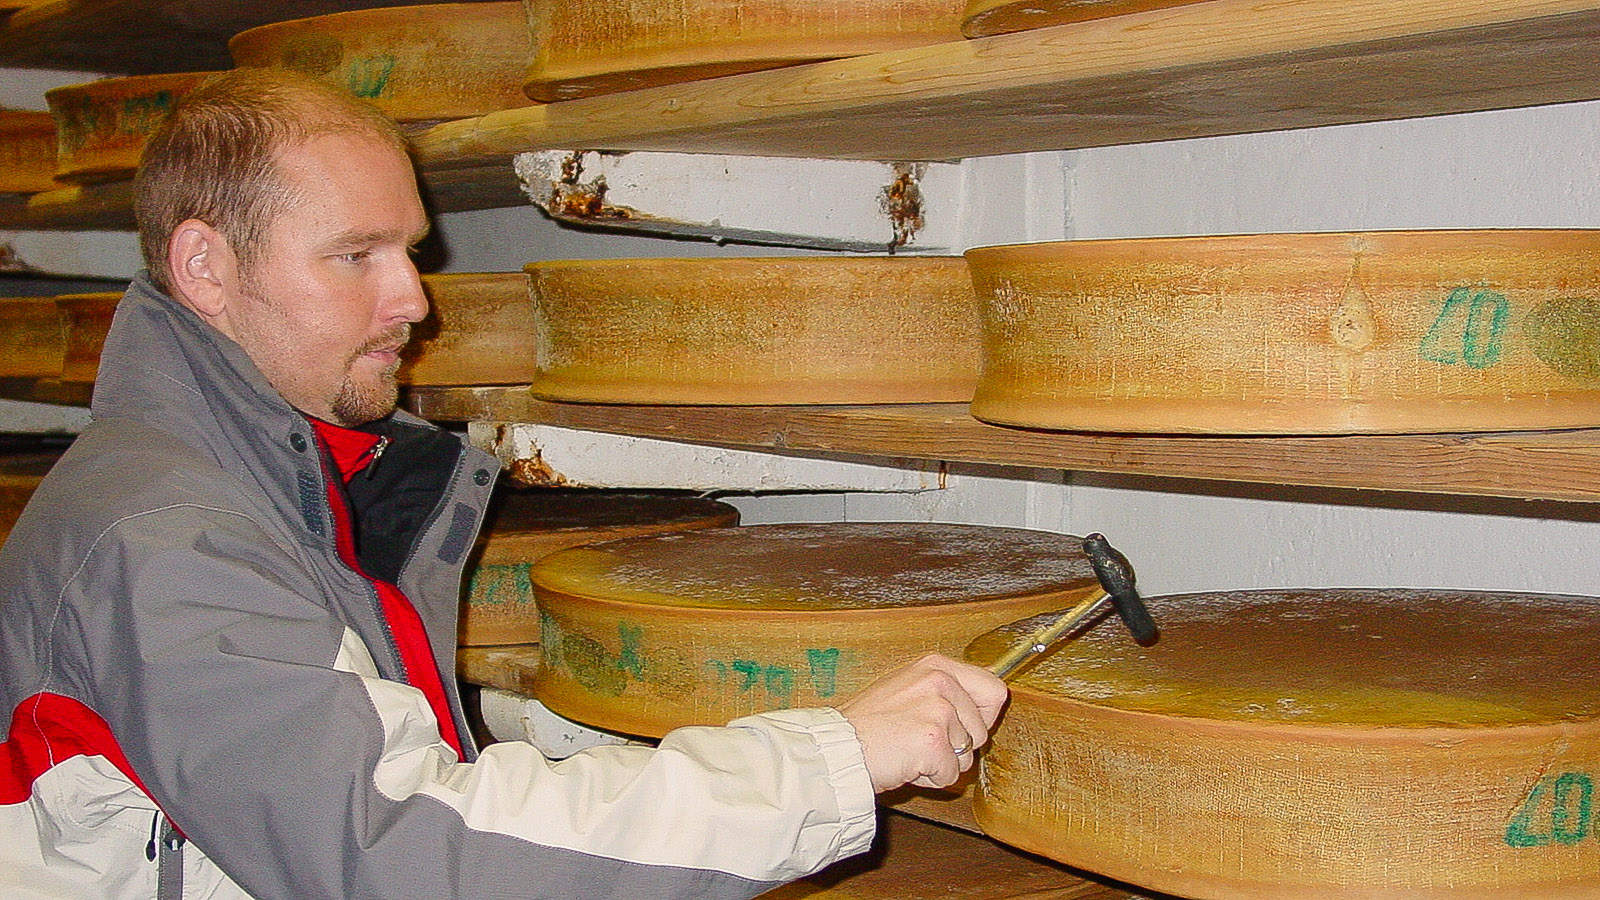 Les Sybelles: St-Sorlin-d'Arves: Fromagerie Cooperative de la Vallee des Arves, Leiter Thomas Airieu prüft mit einem kleinen Hämmerchen im Reifekeller die Qualität des Beaufort-Käse (A.O.C.). Foto: Hilke Maunder